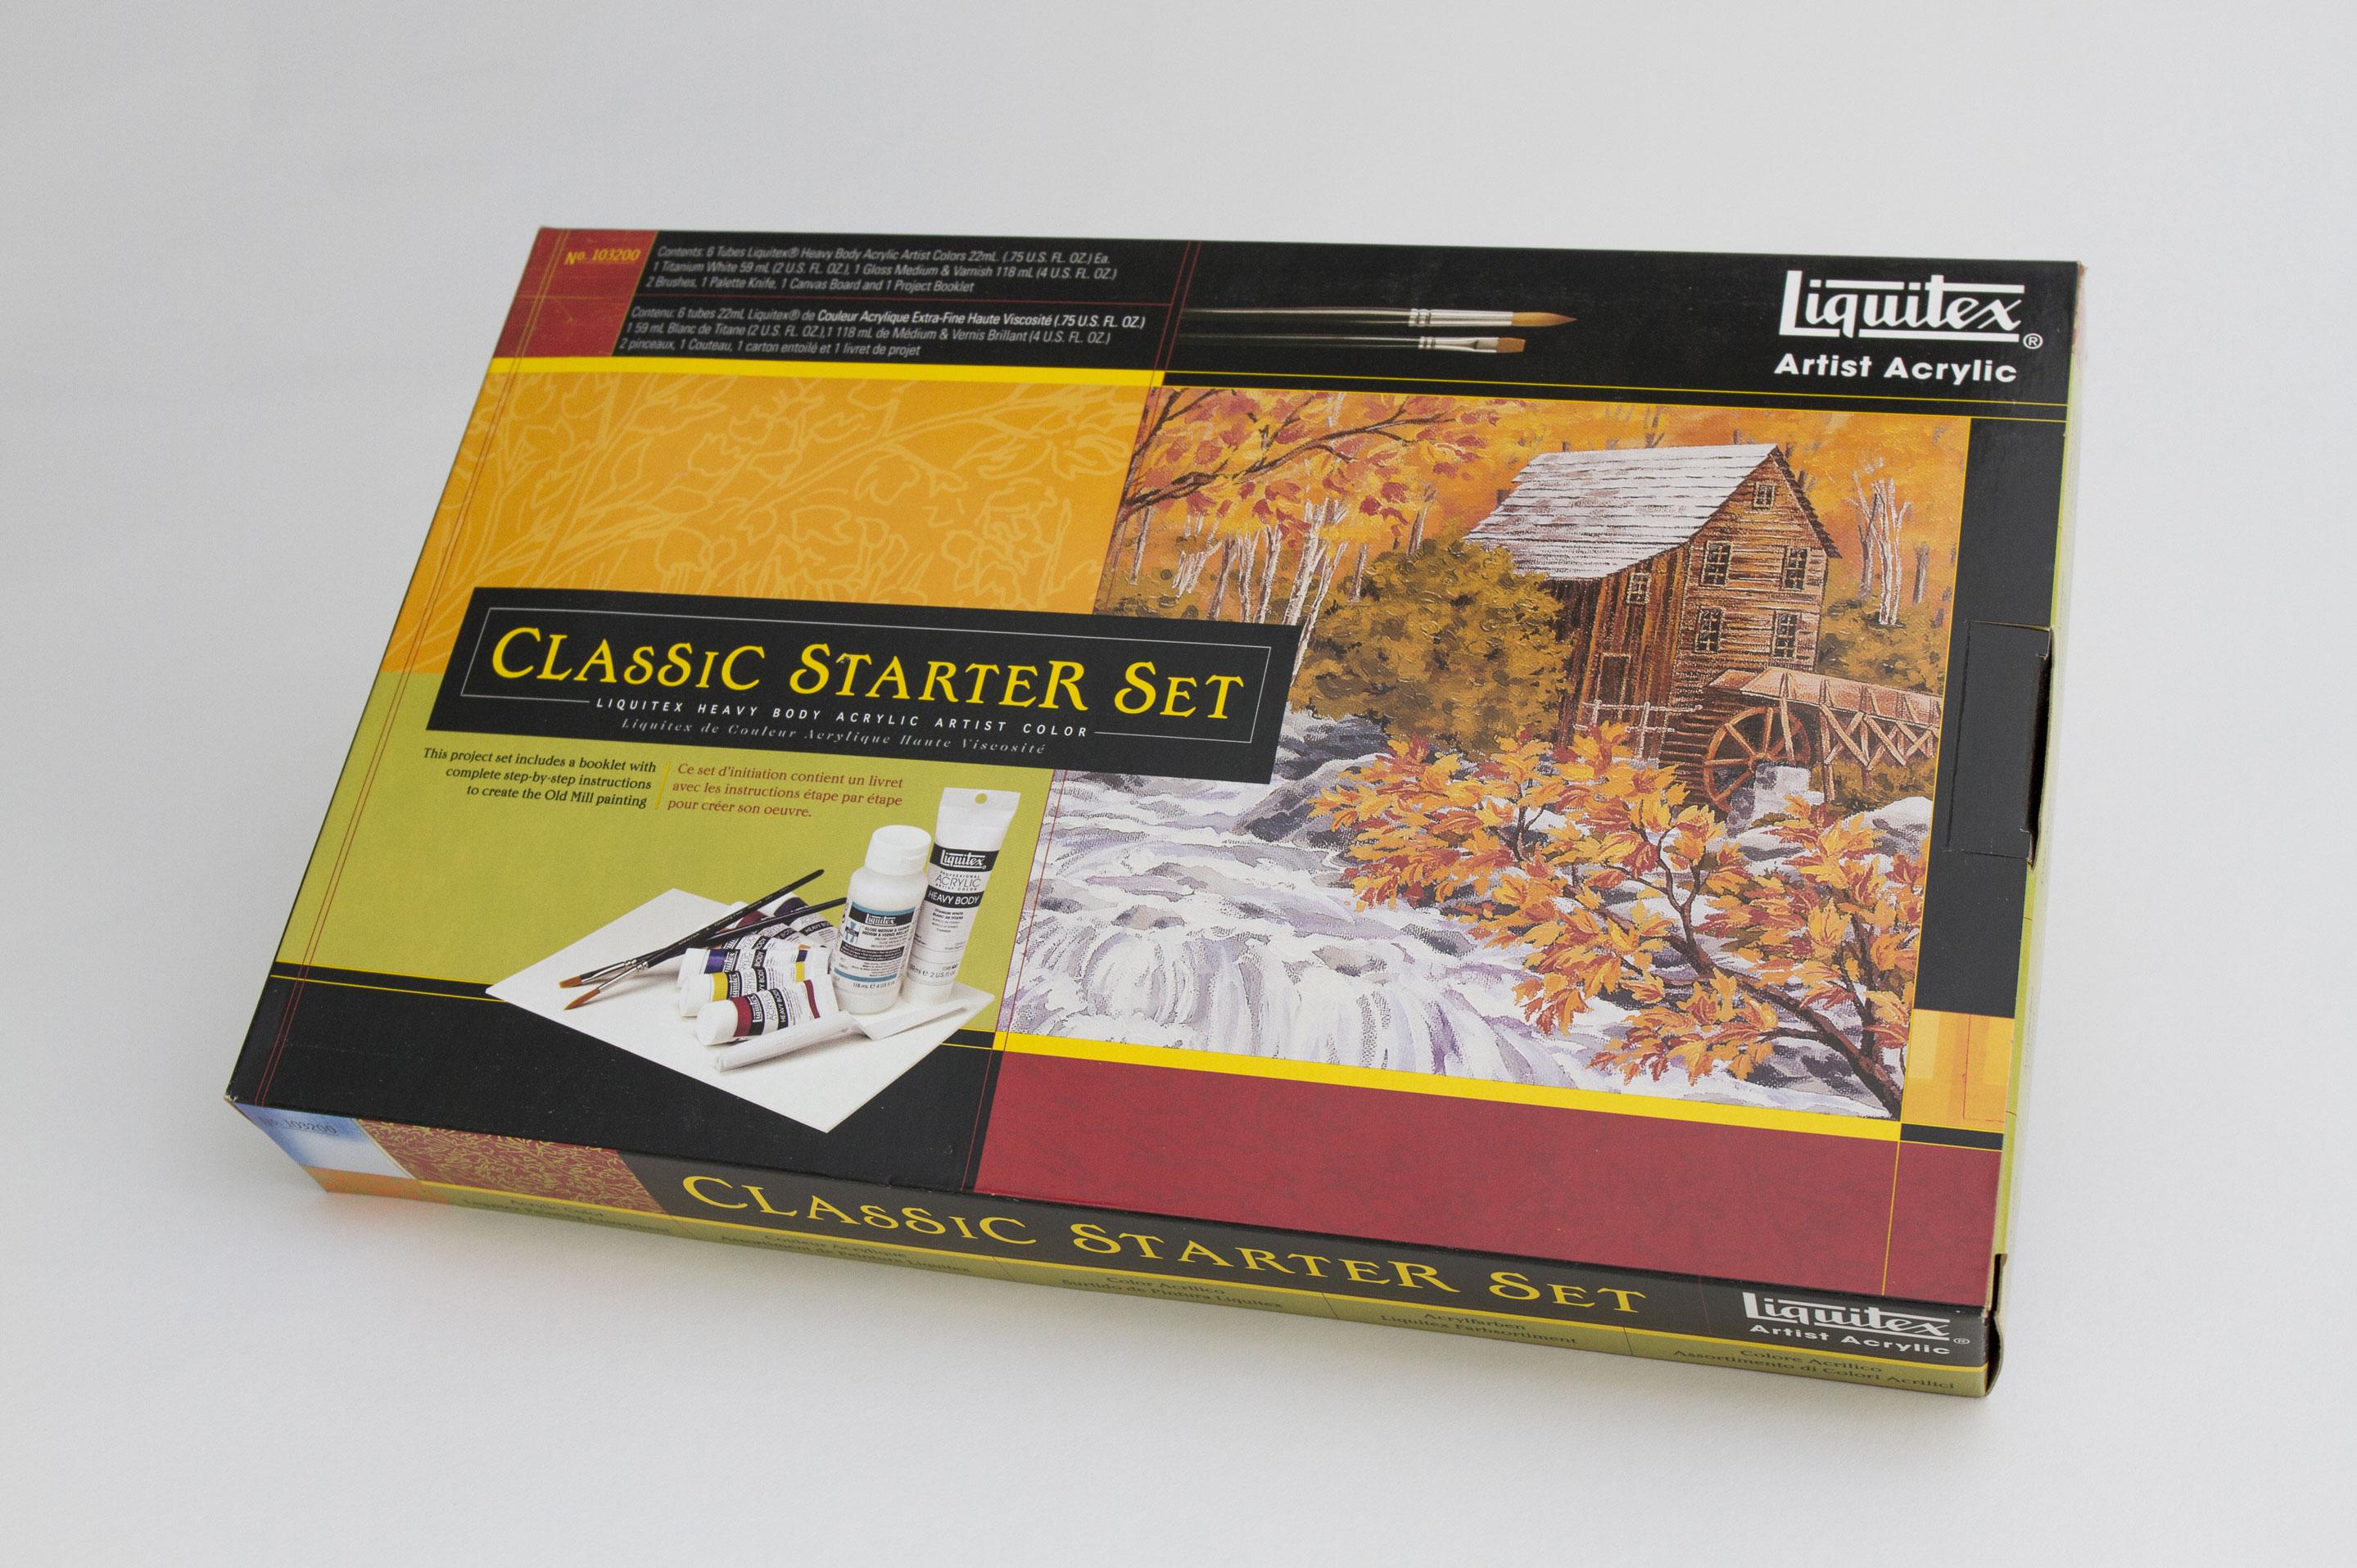 Liquitex packaging